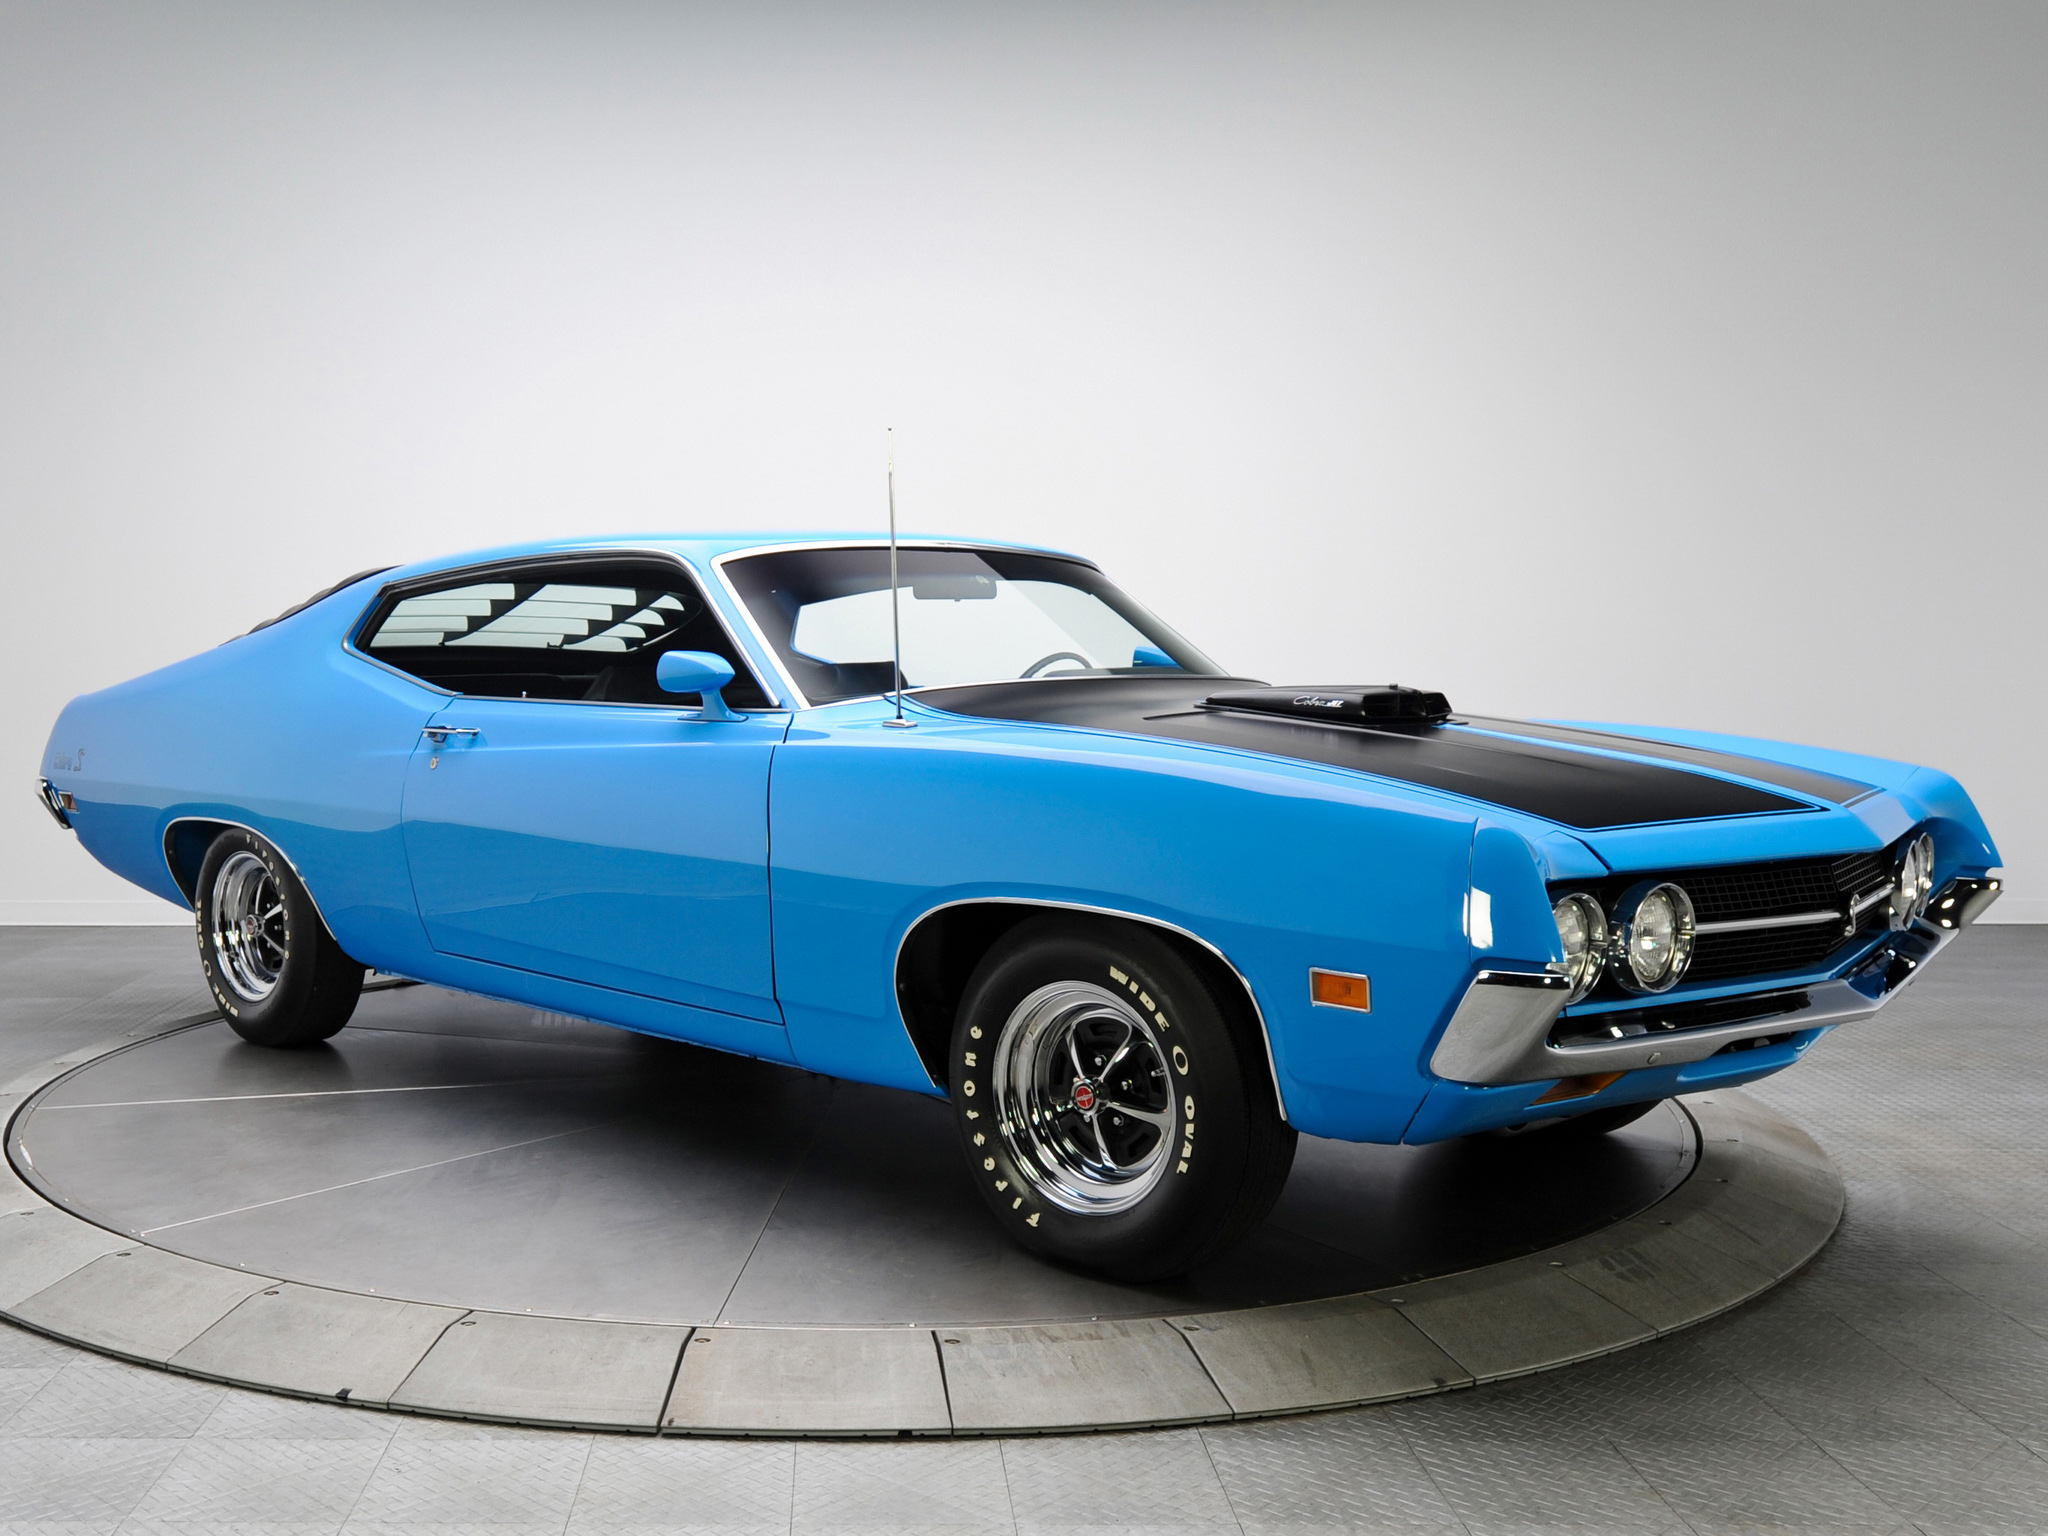 1971 ford torino cobra 429 c j 63h muscle classic f wallpaper 2048x1536 115047 wallpaperup